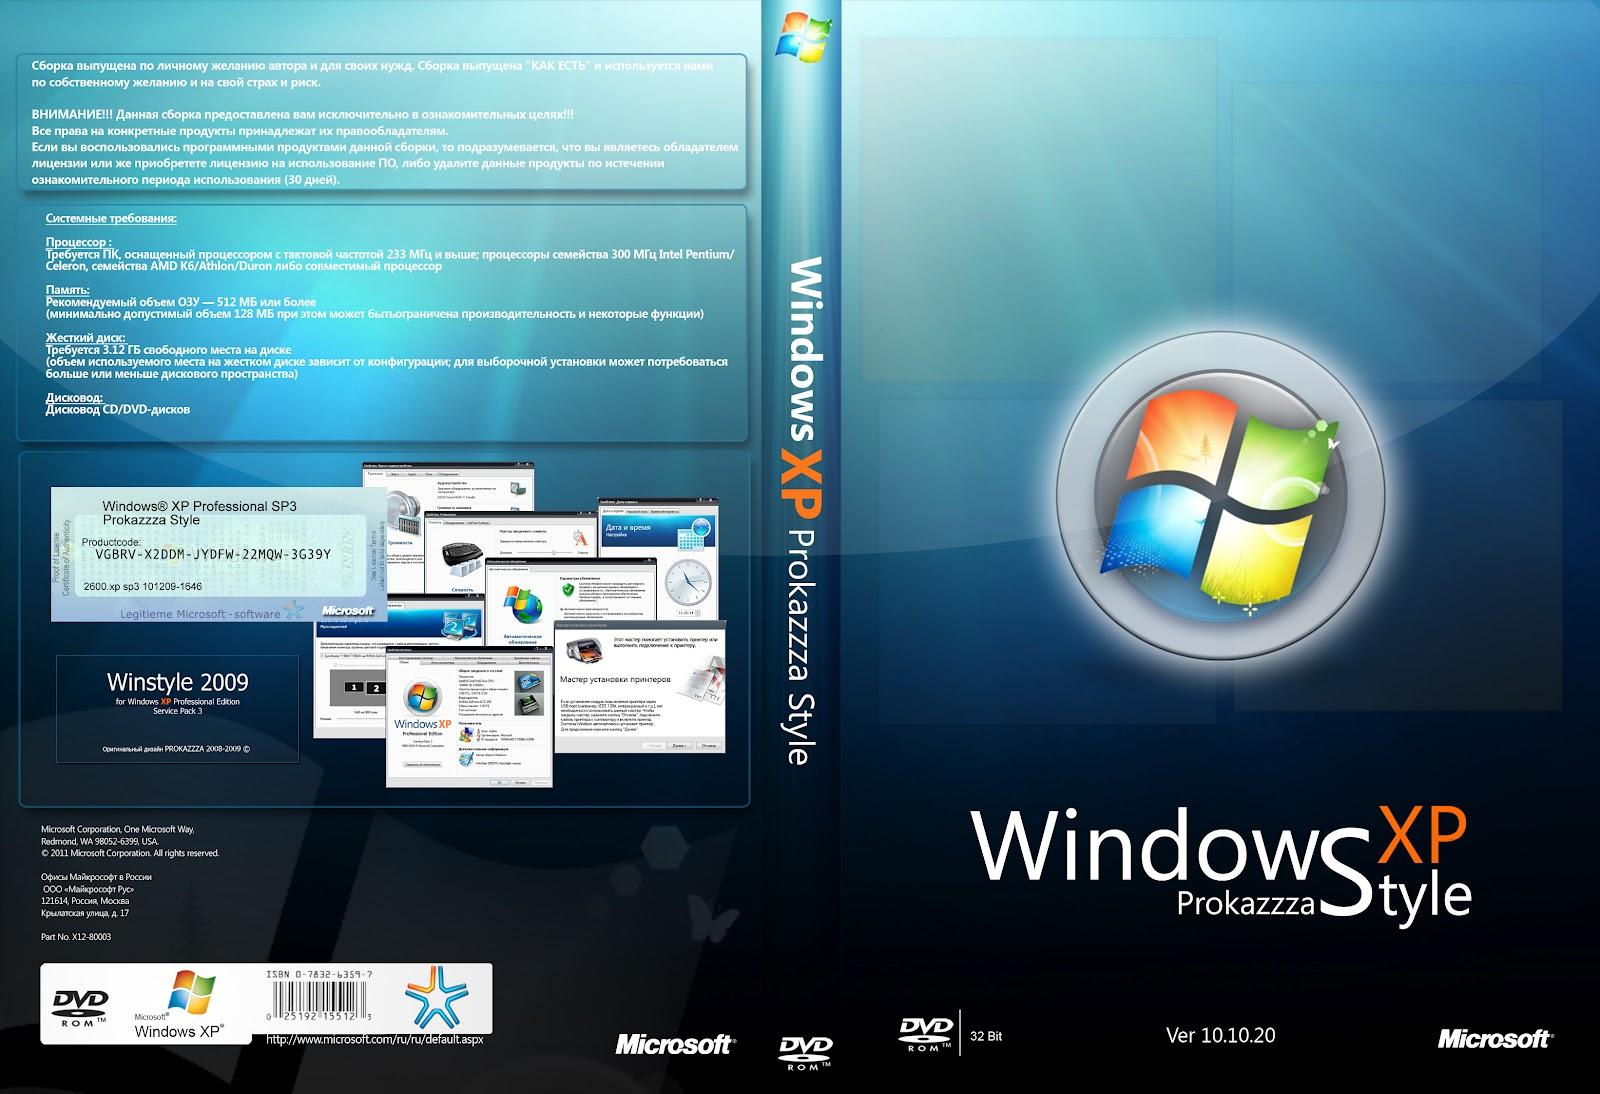 Microsoft hot fix kb893357 download